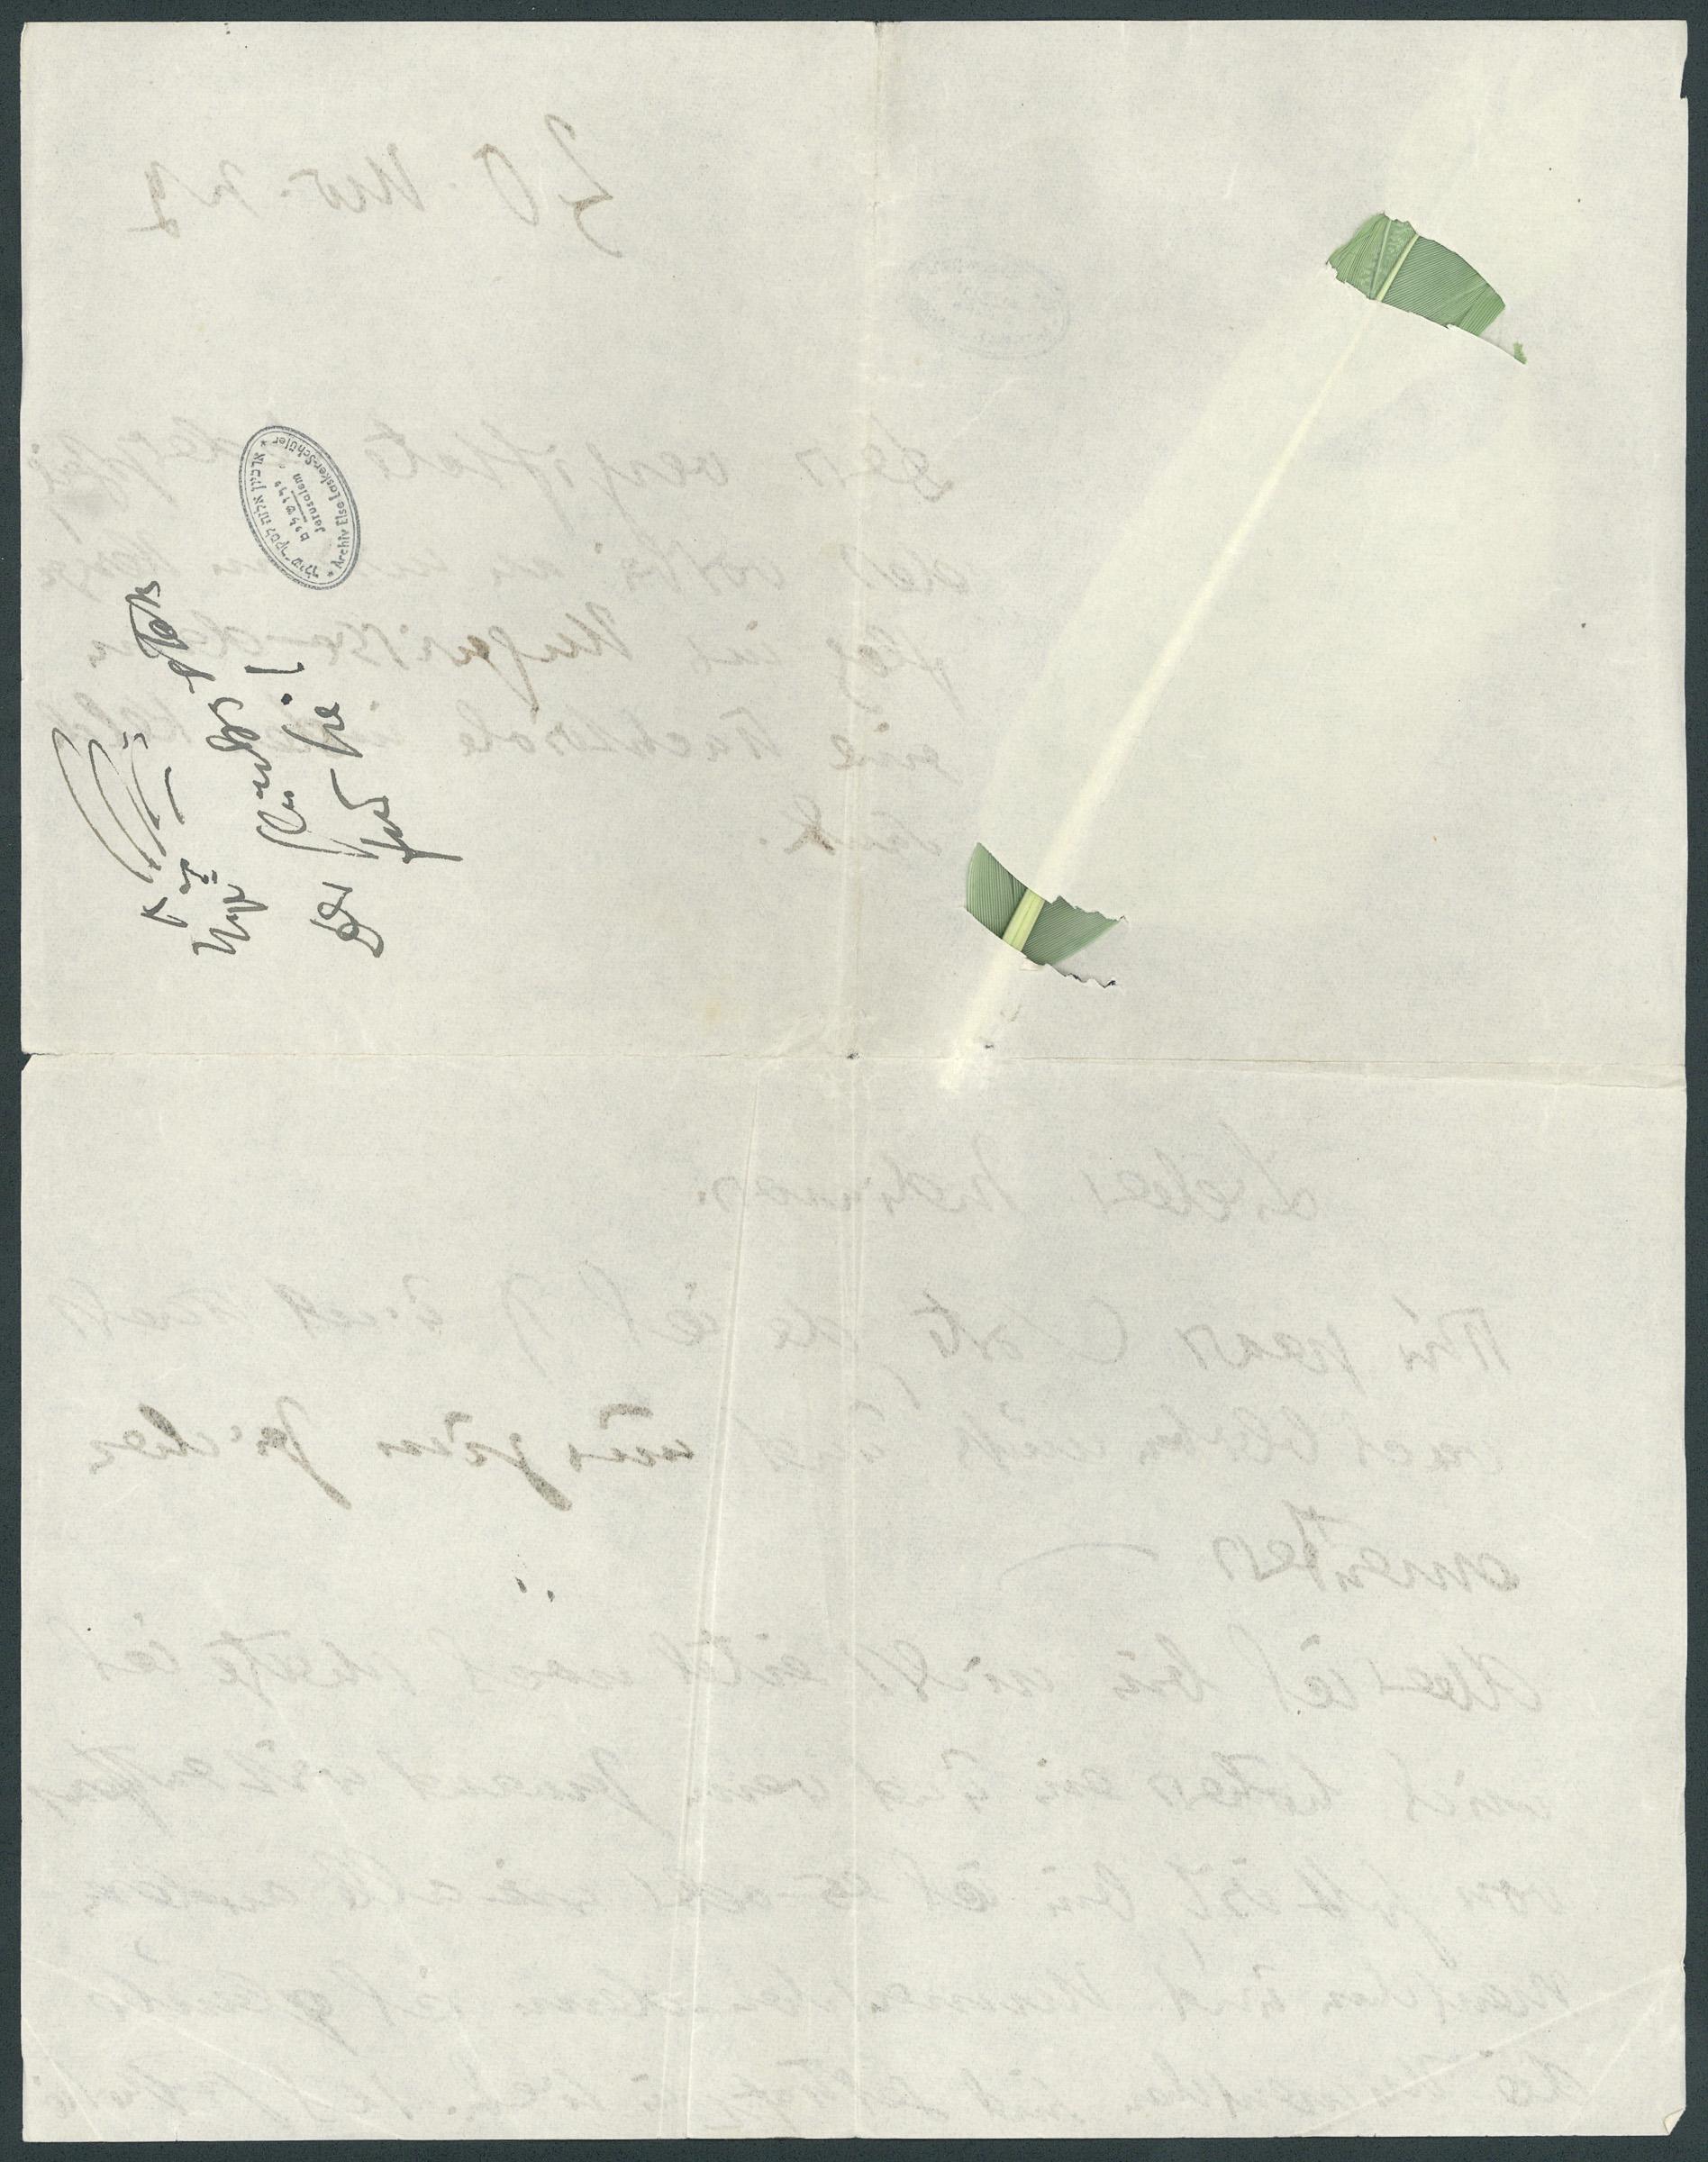 Letter to Paul Goldscheider (p. 2)